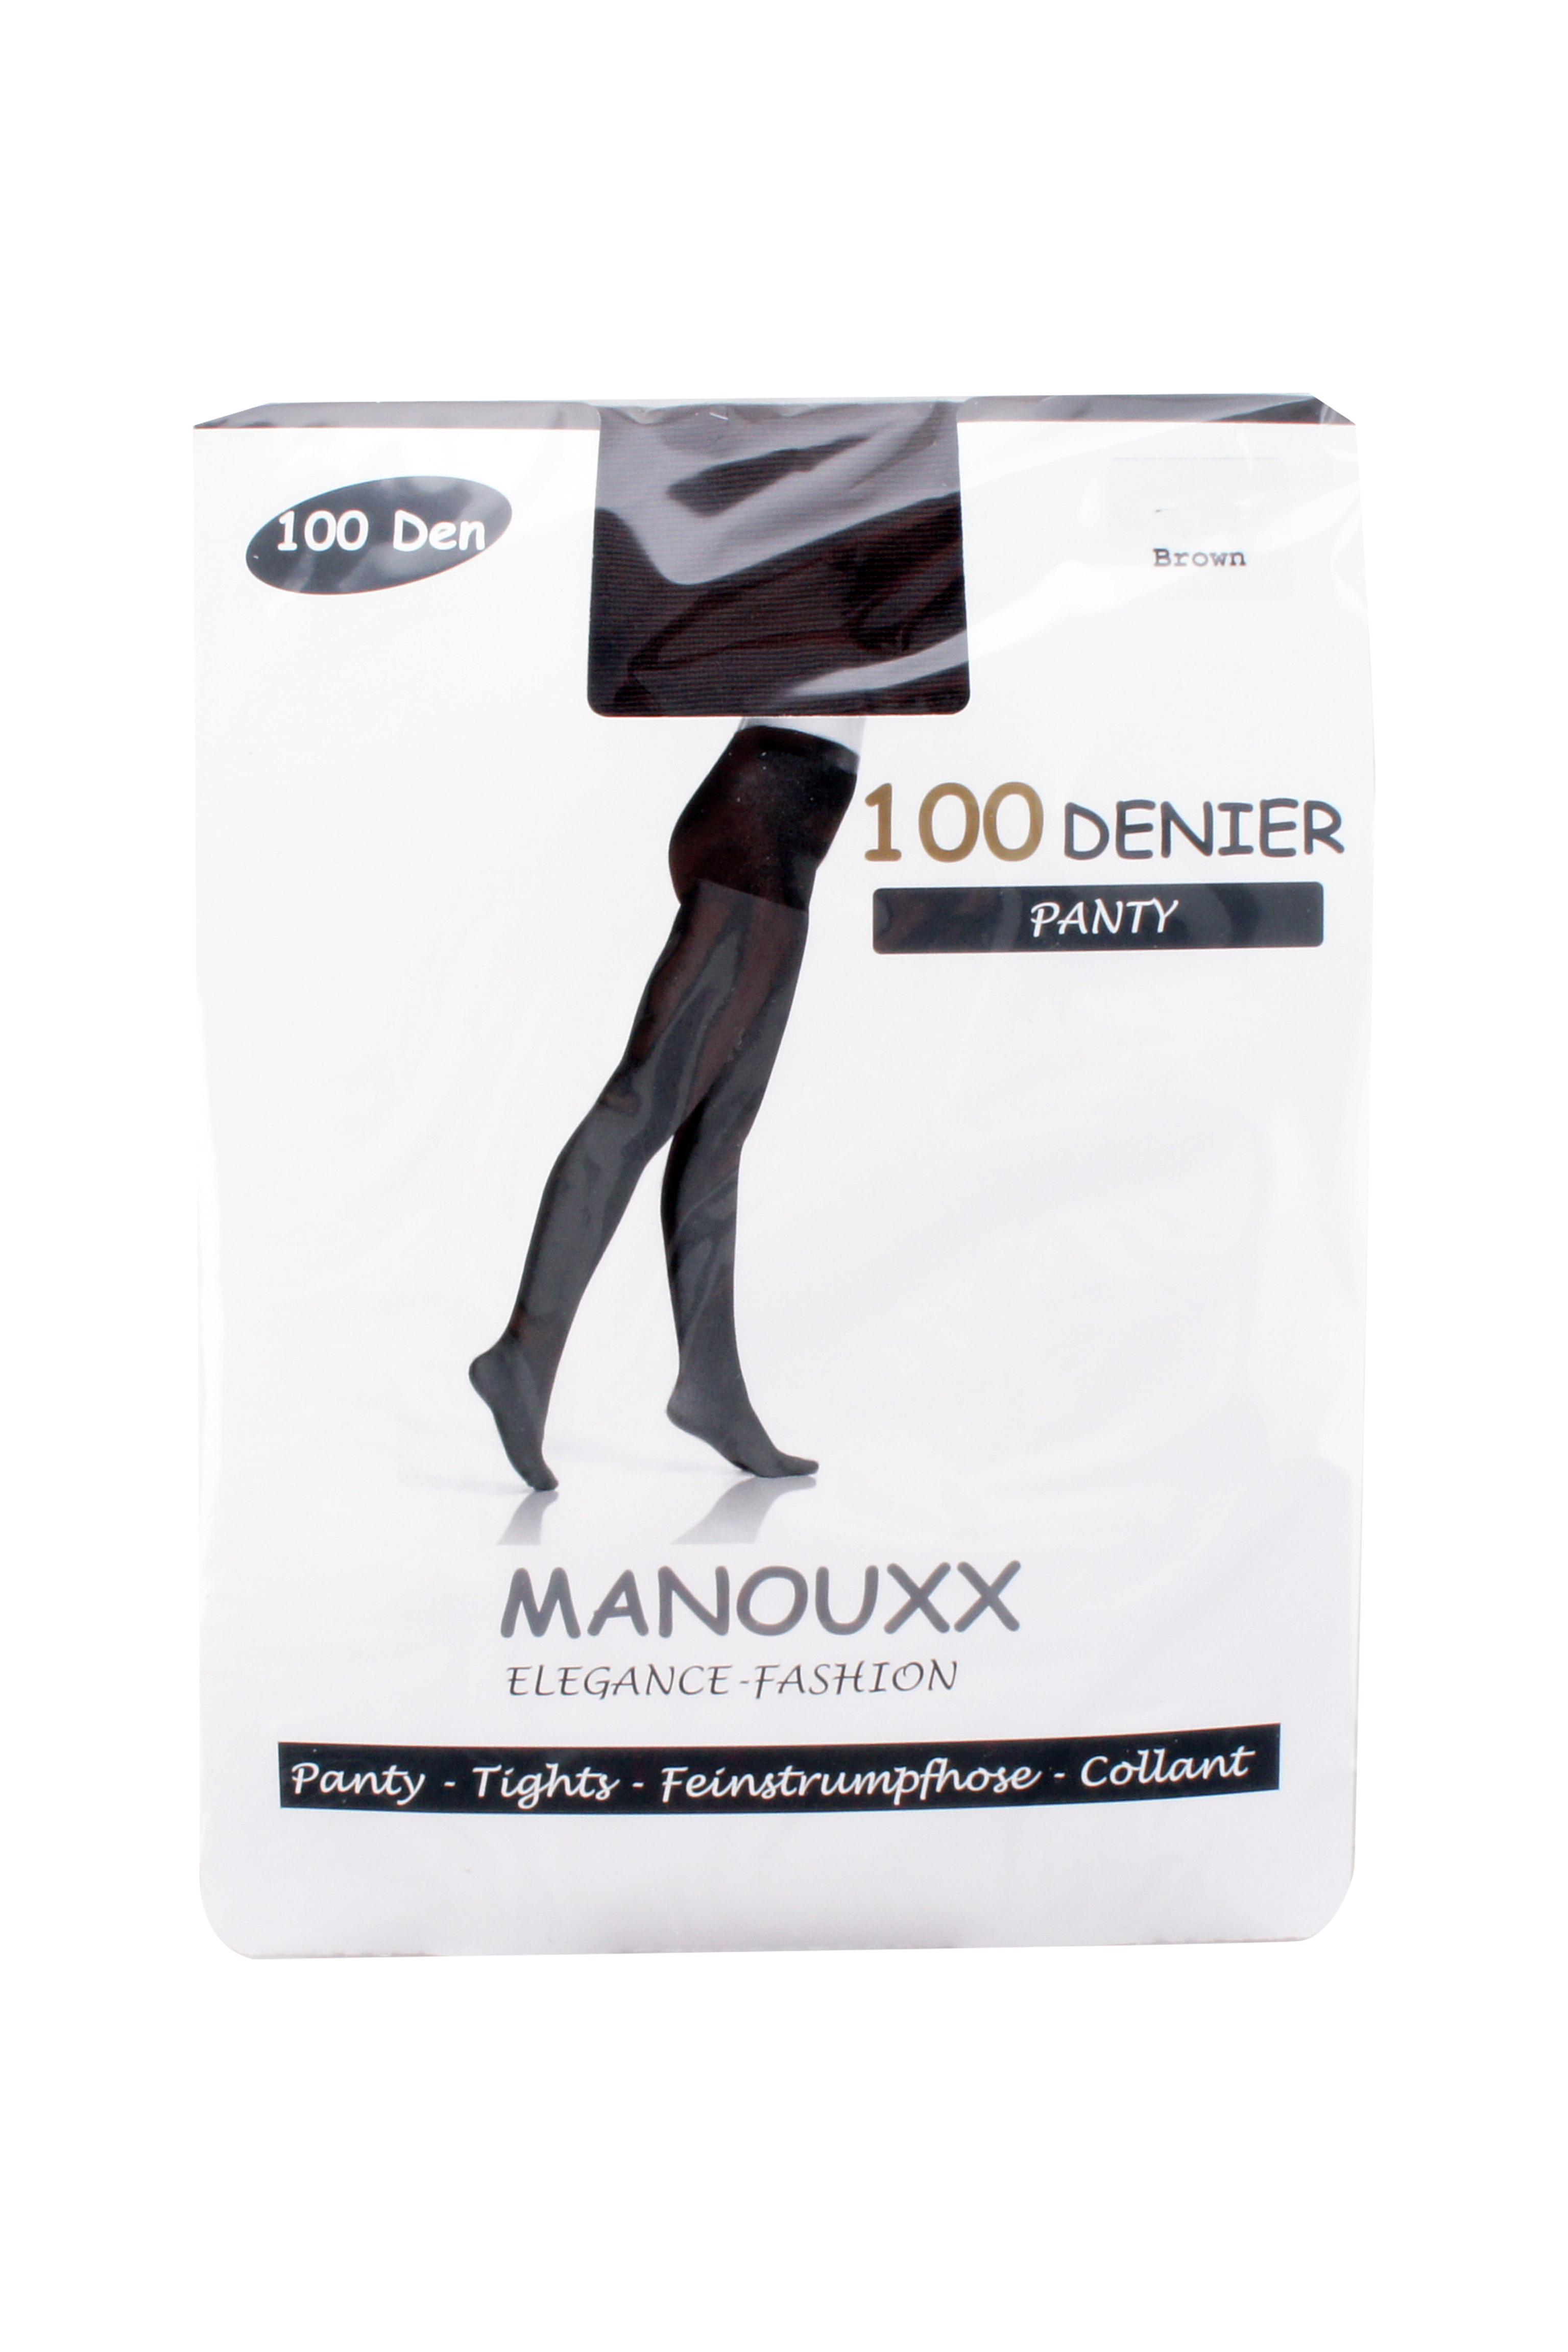 Manouxx Panty Elegance 100 Den Bruin